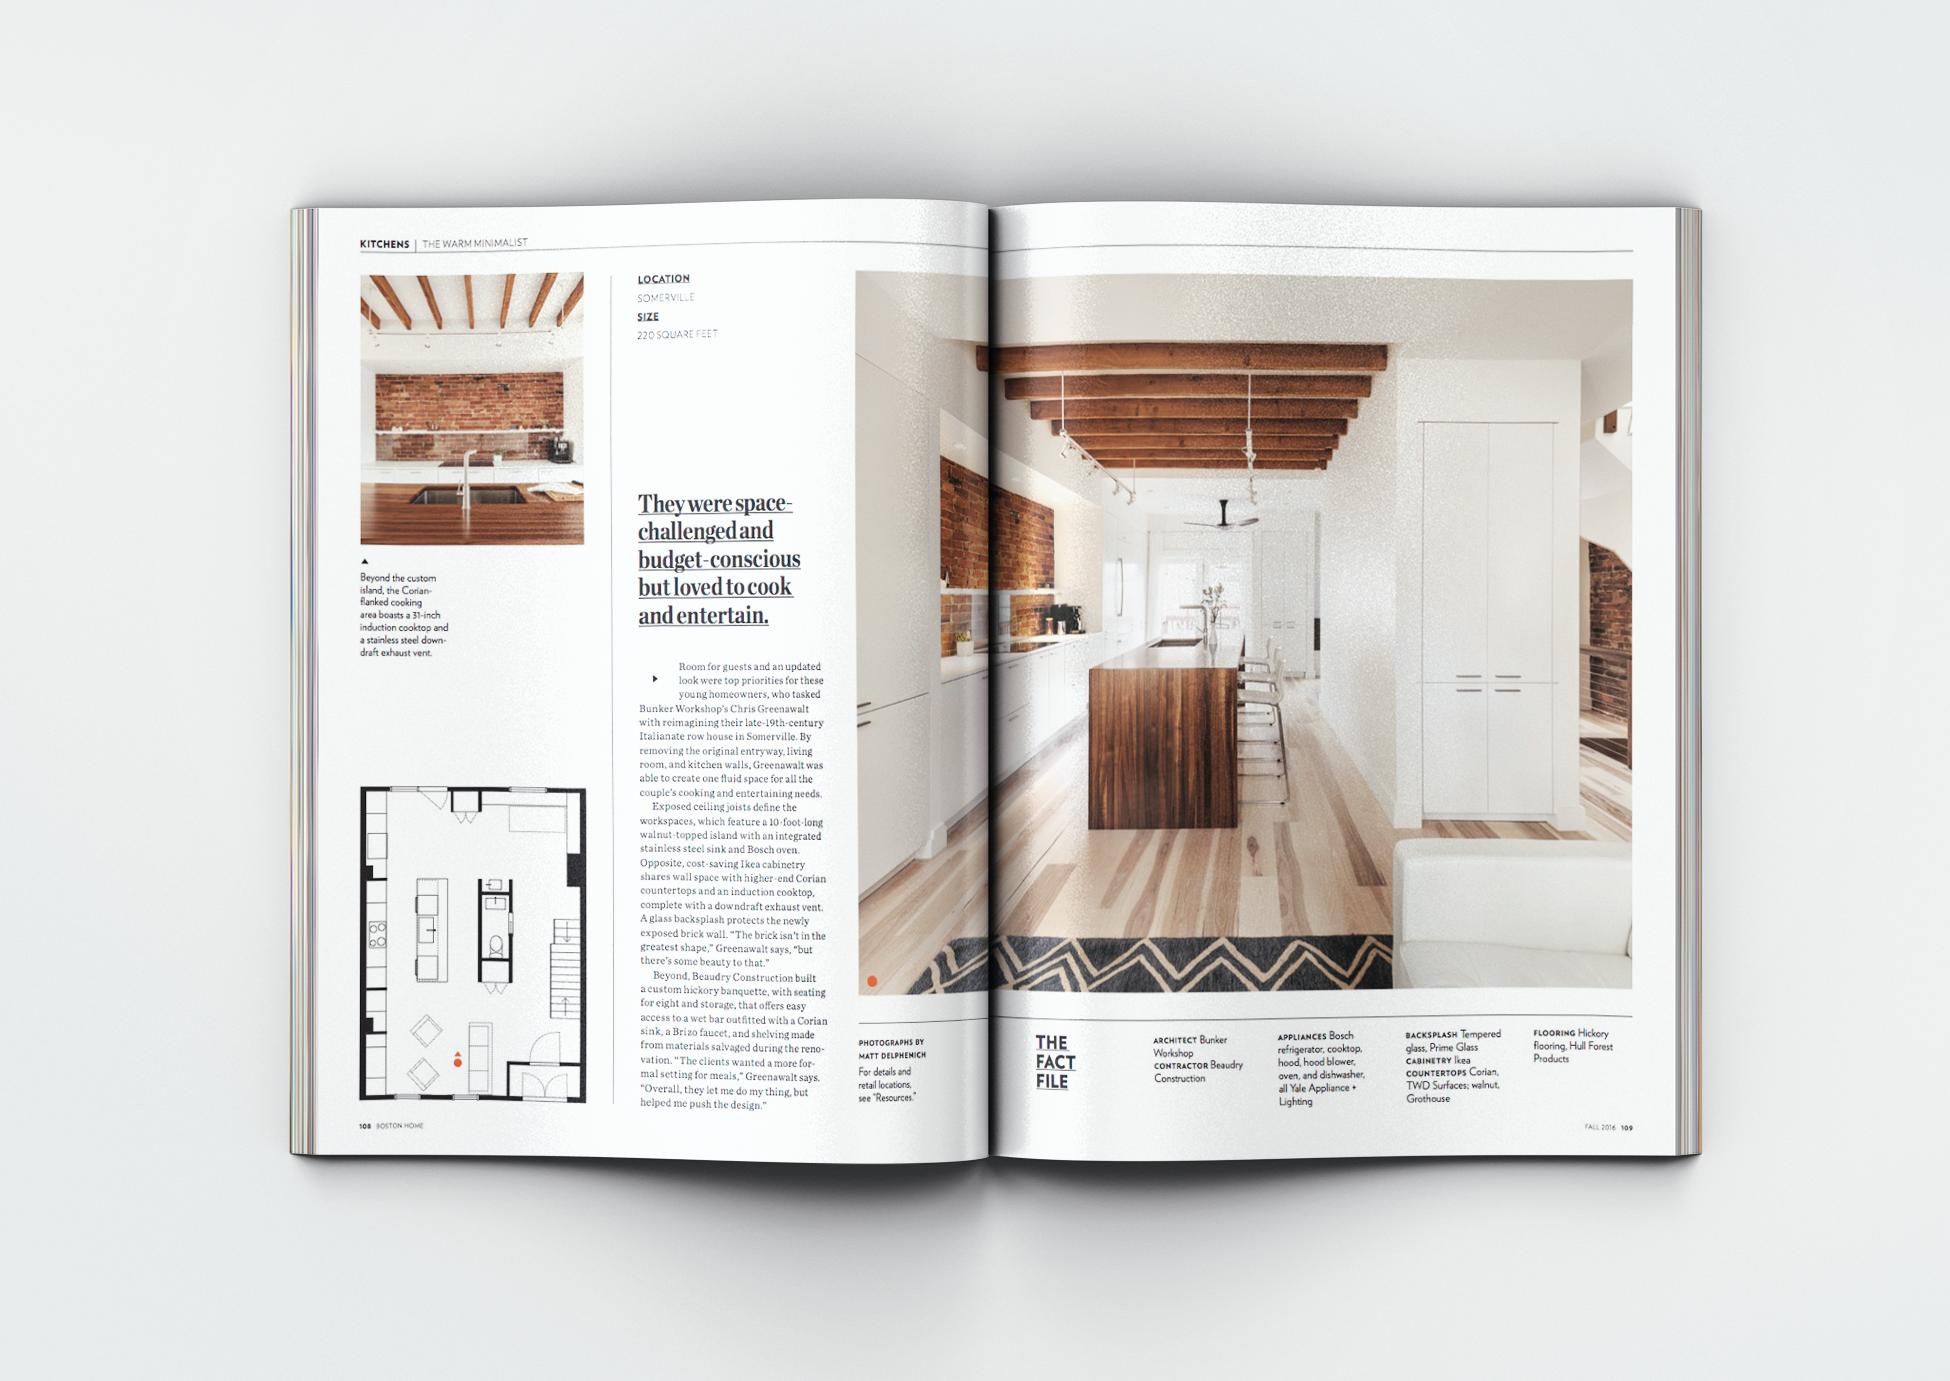 home_kitchens16_7 copy copy.png